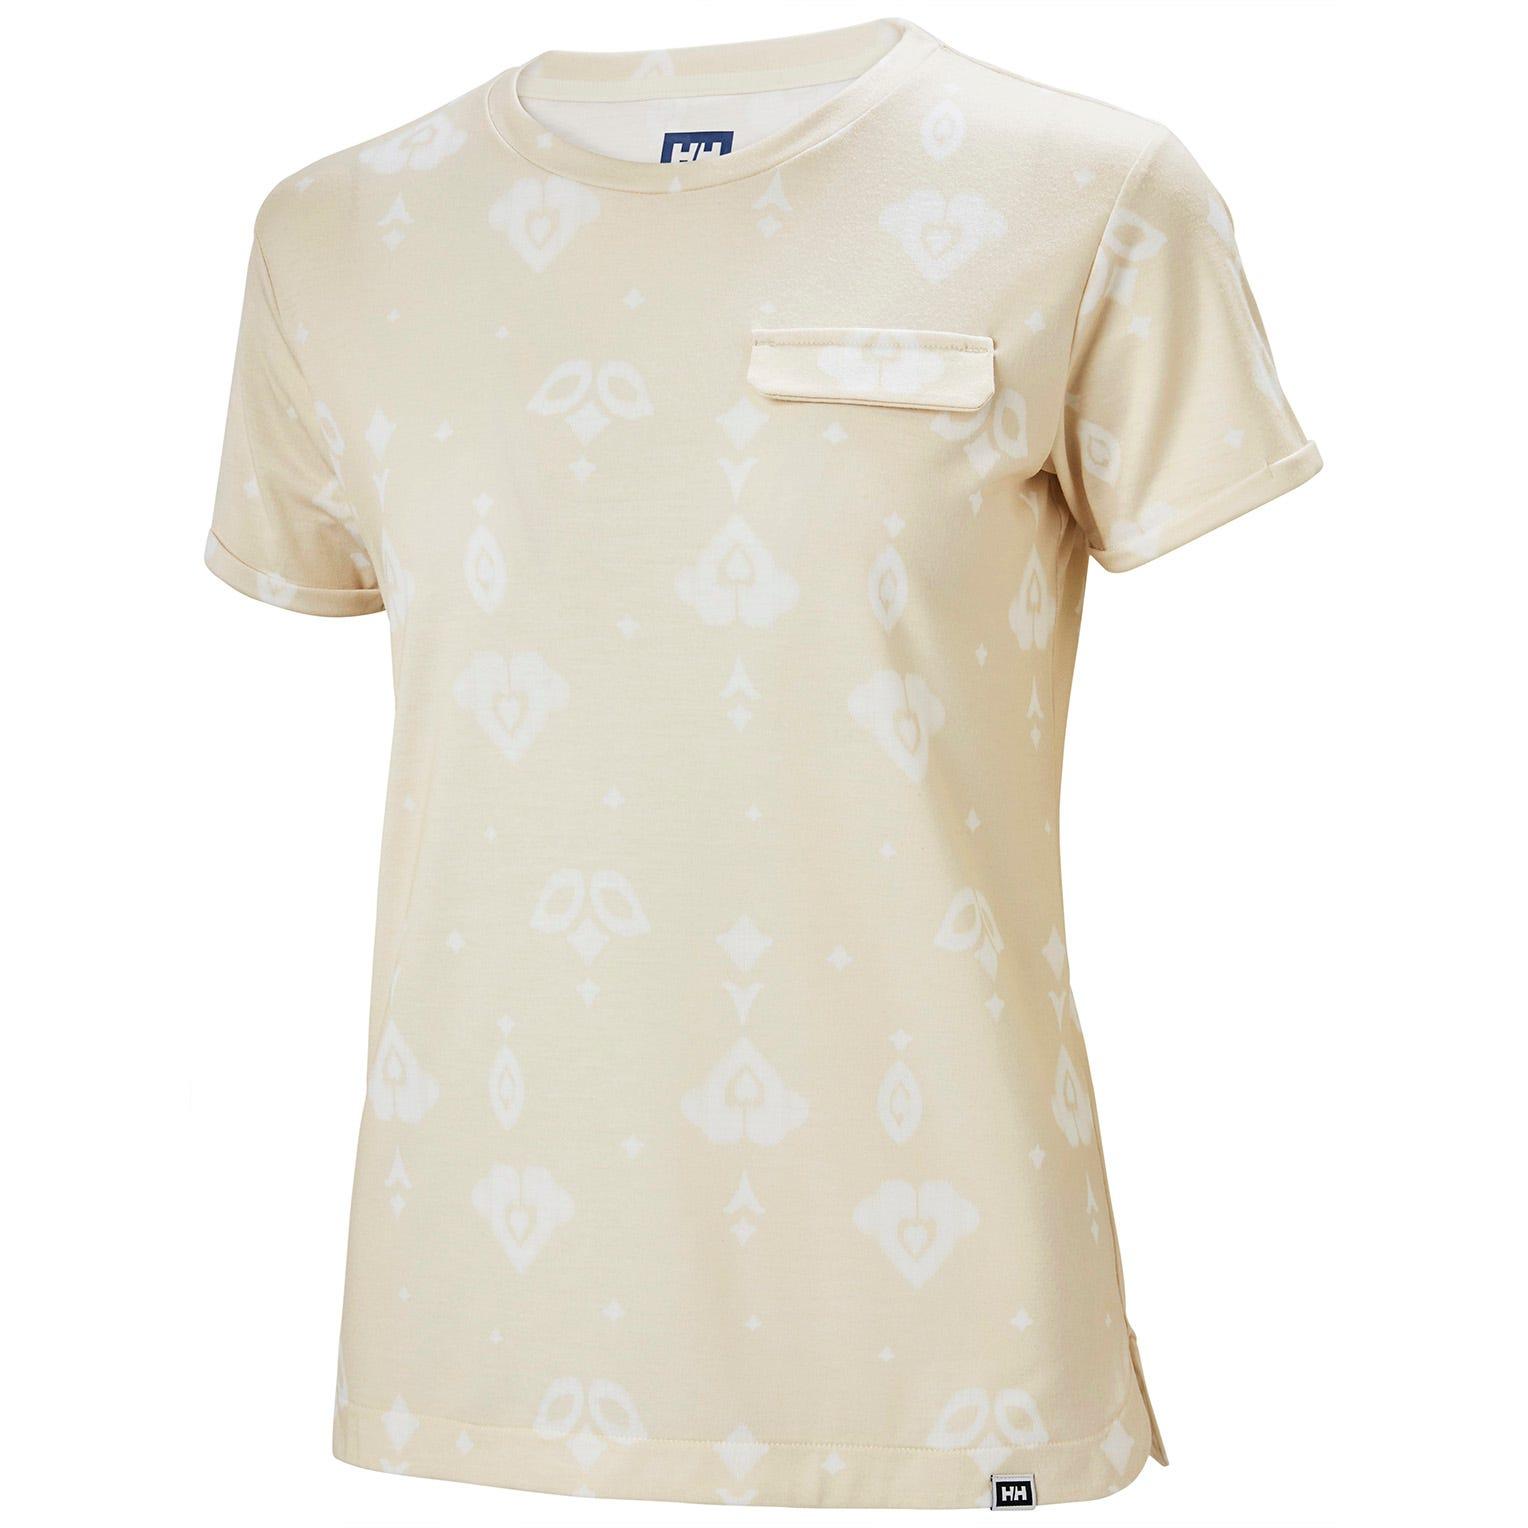 Helly Hansen Womens Lomma Tshirt White S